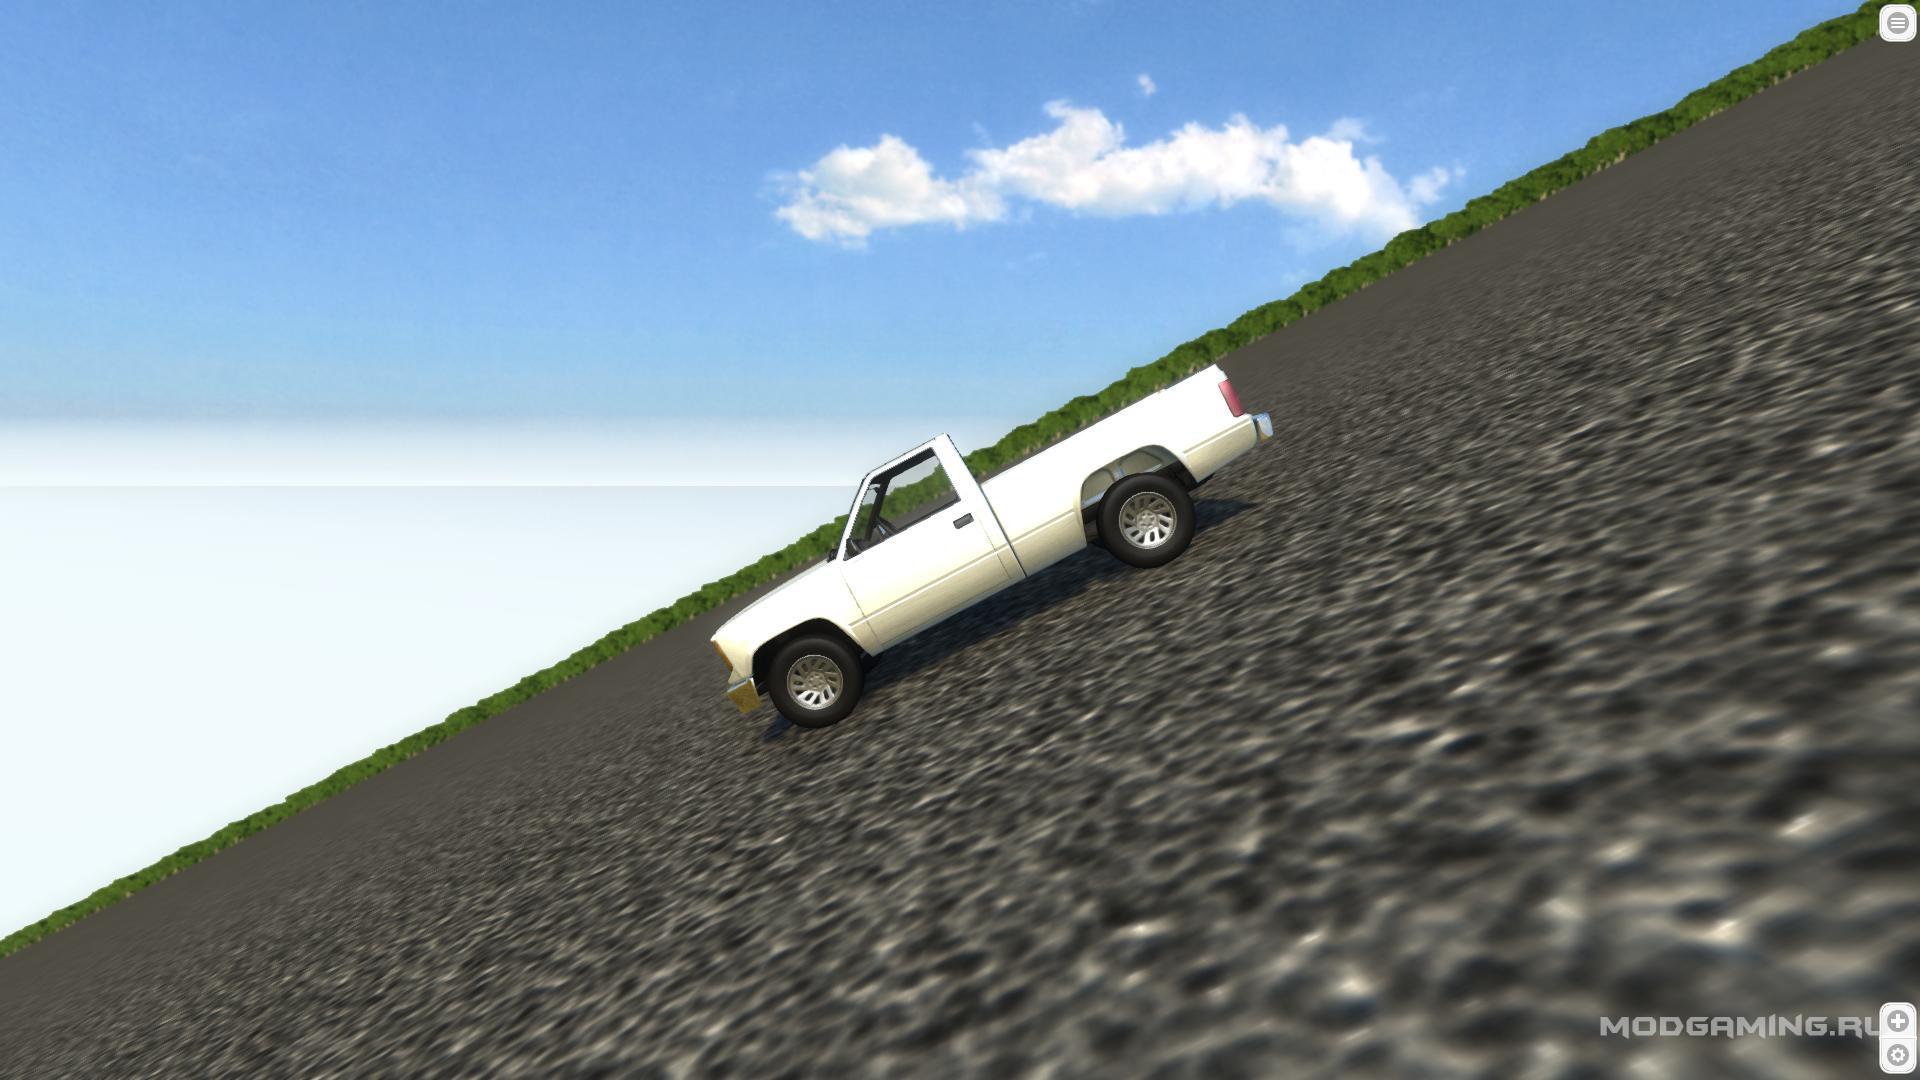 Fast Crazy Downhill